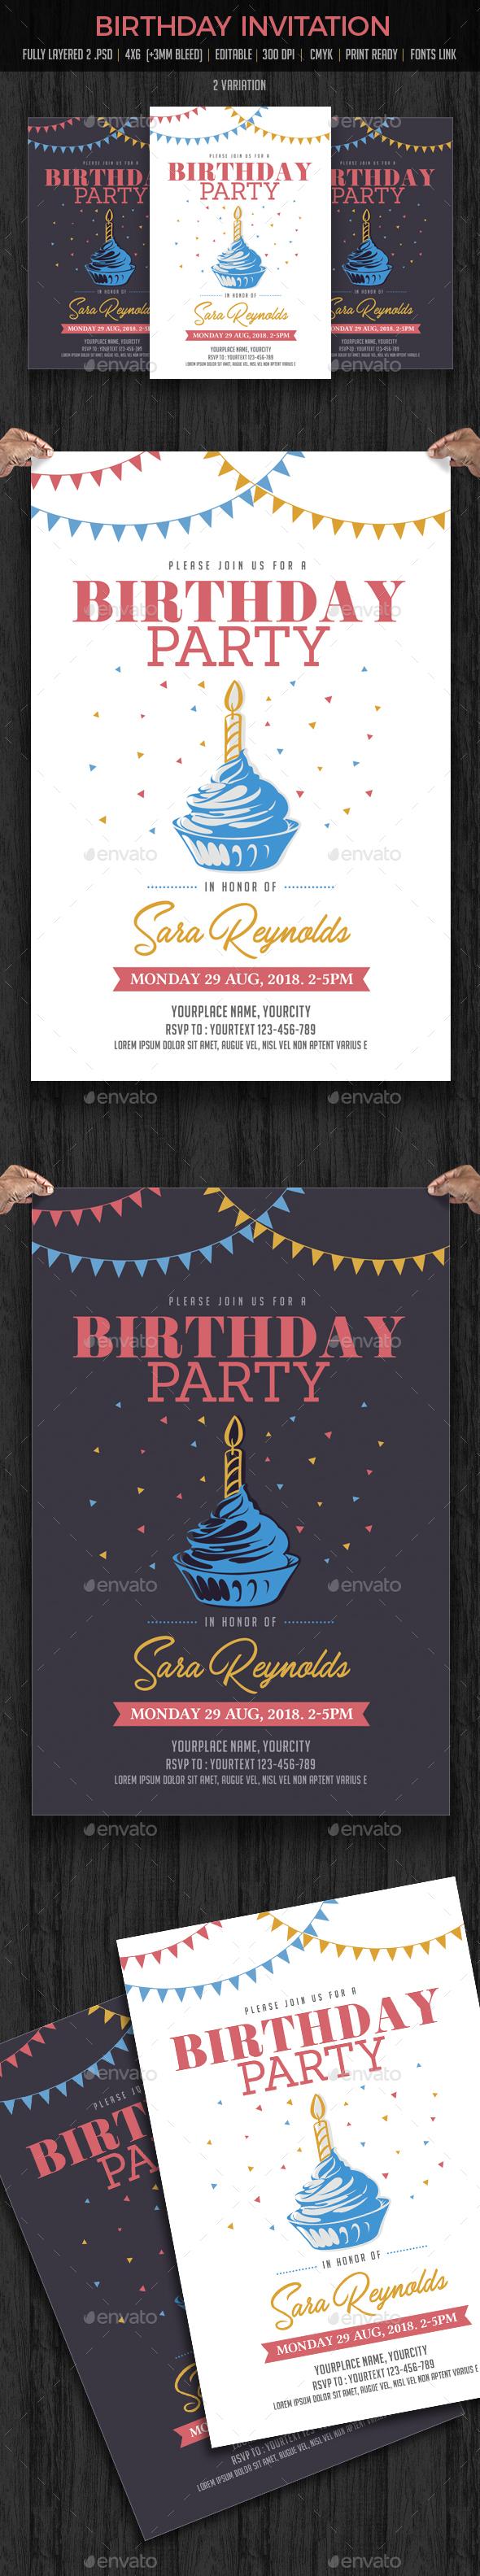 Birthday Invitation - Cards & Invites Print Templates